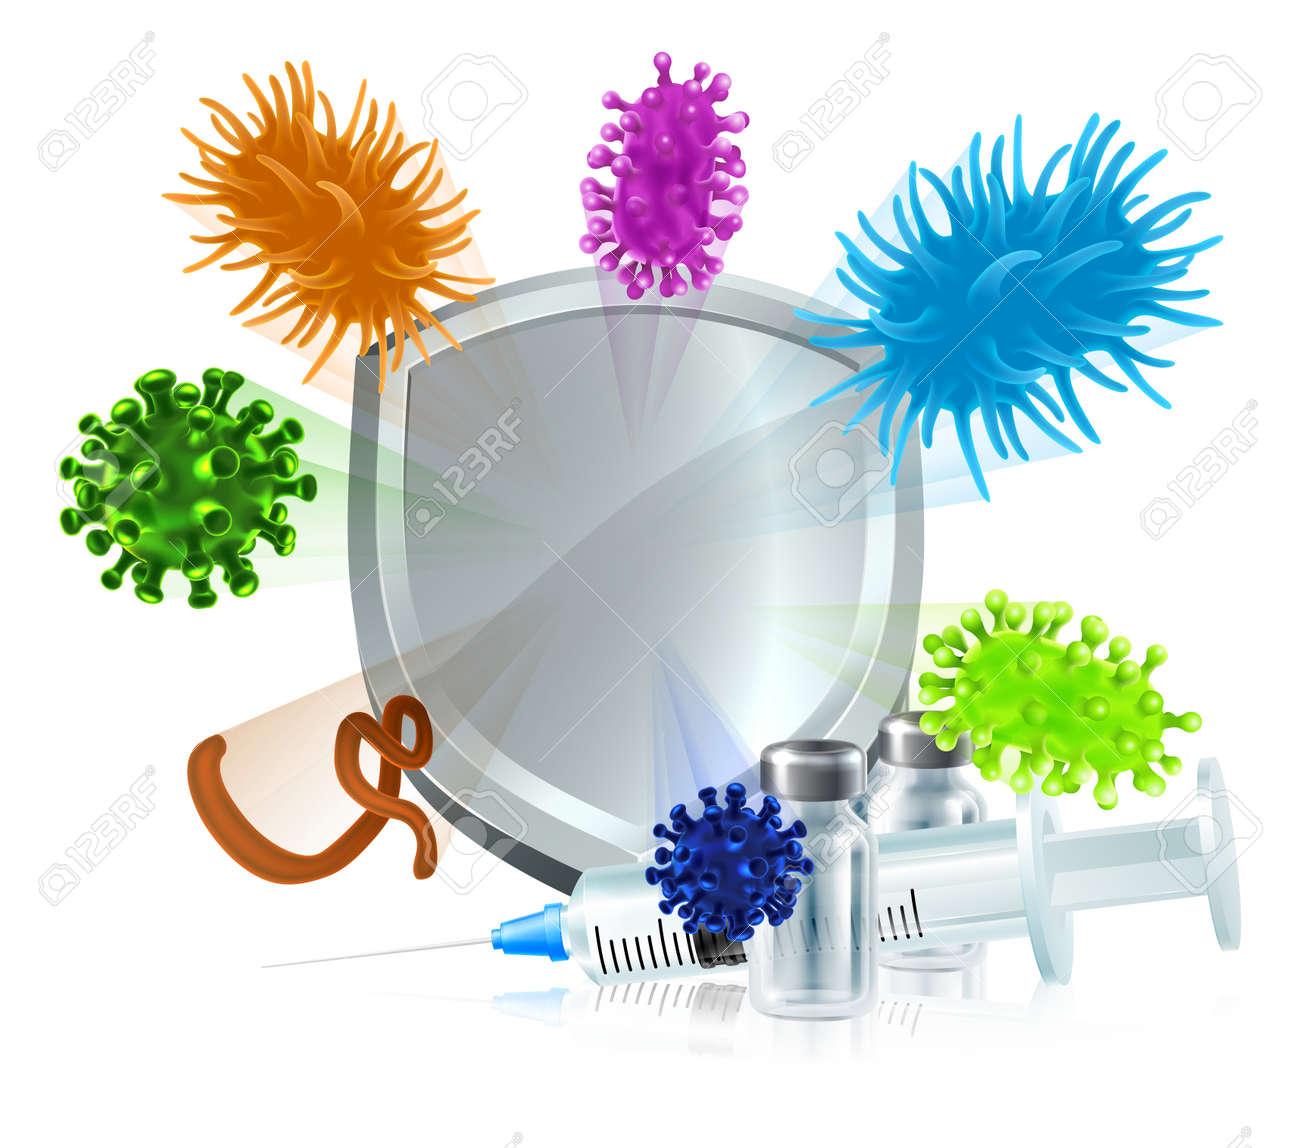 Vaccine Medicine Syringe Virus Medical Shield - 171956971